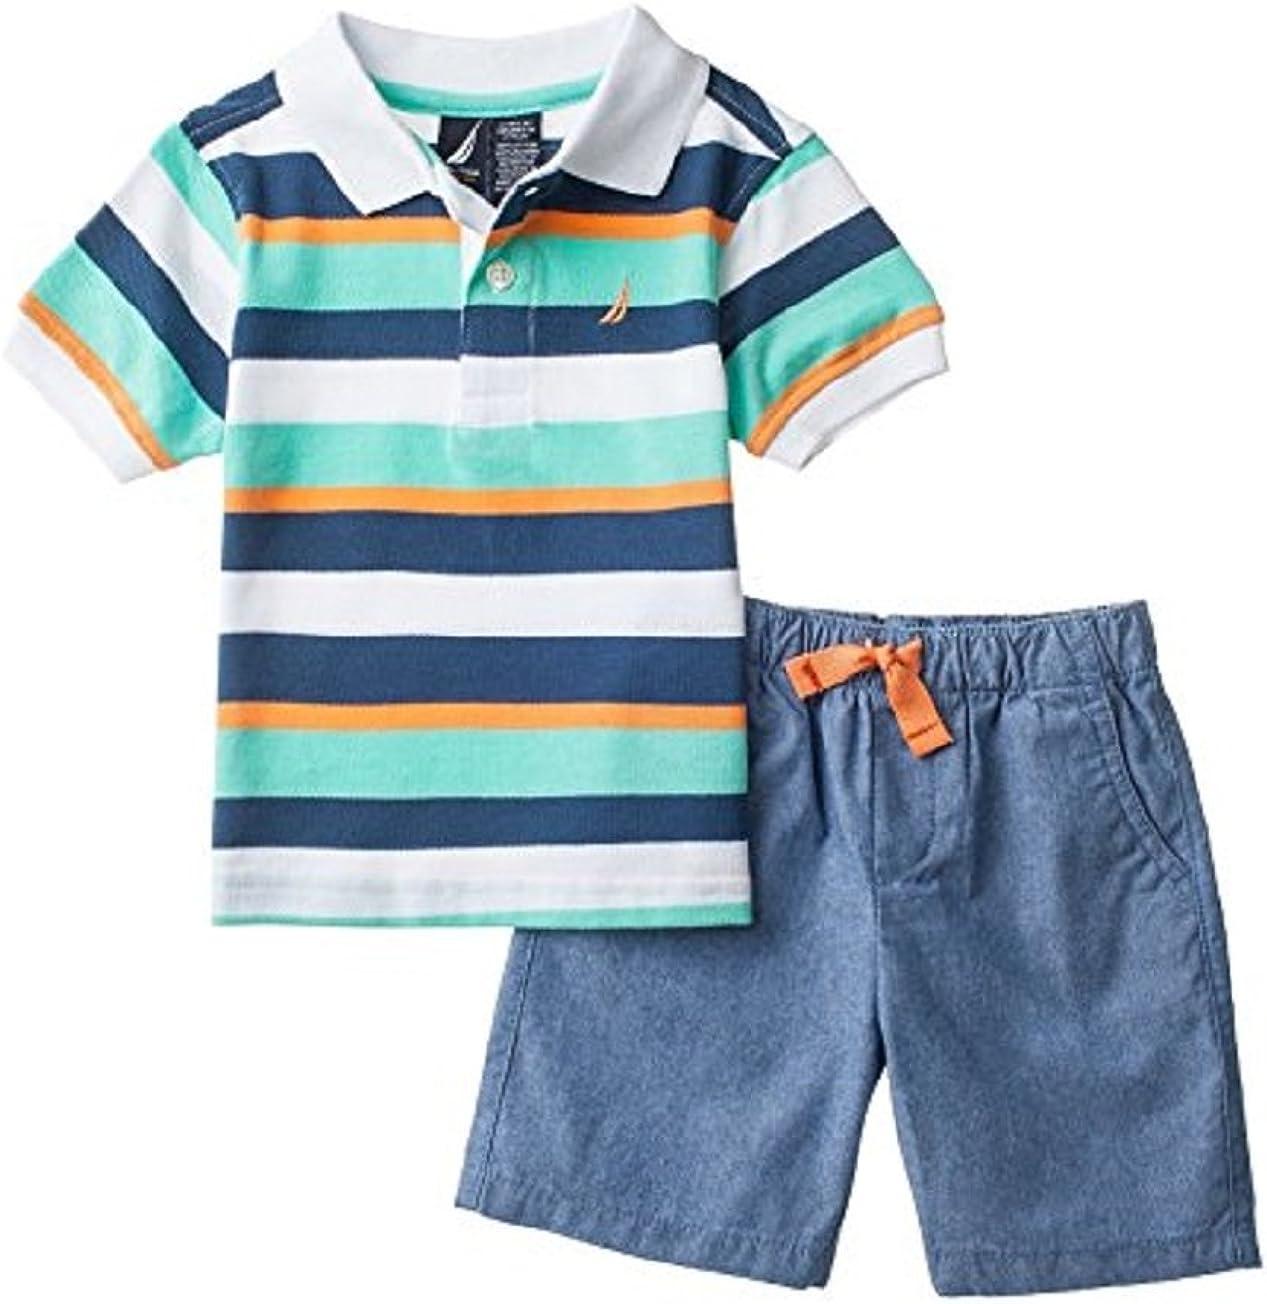 stripes summer clothes vacation 24 months baby Toddler shorts handmade unisex neutral boy girl blue grey ocean fish boat swim beach